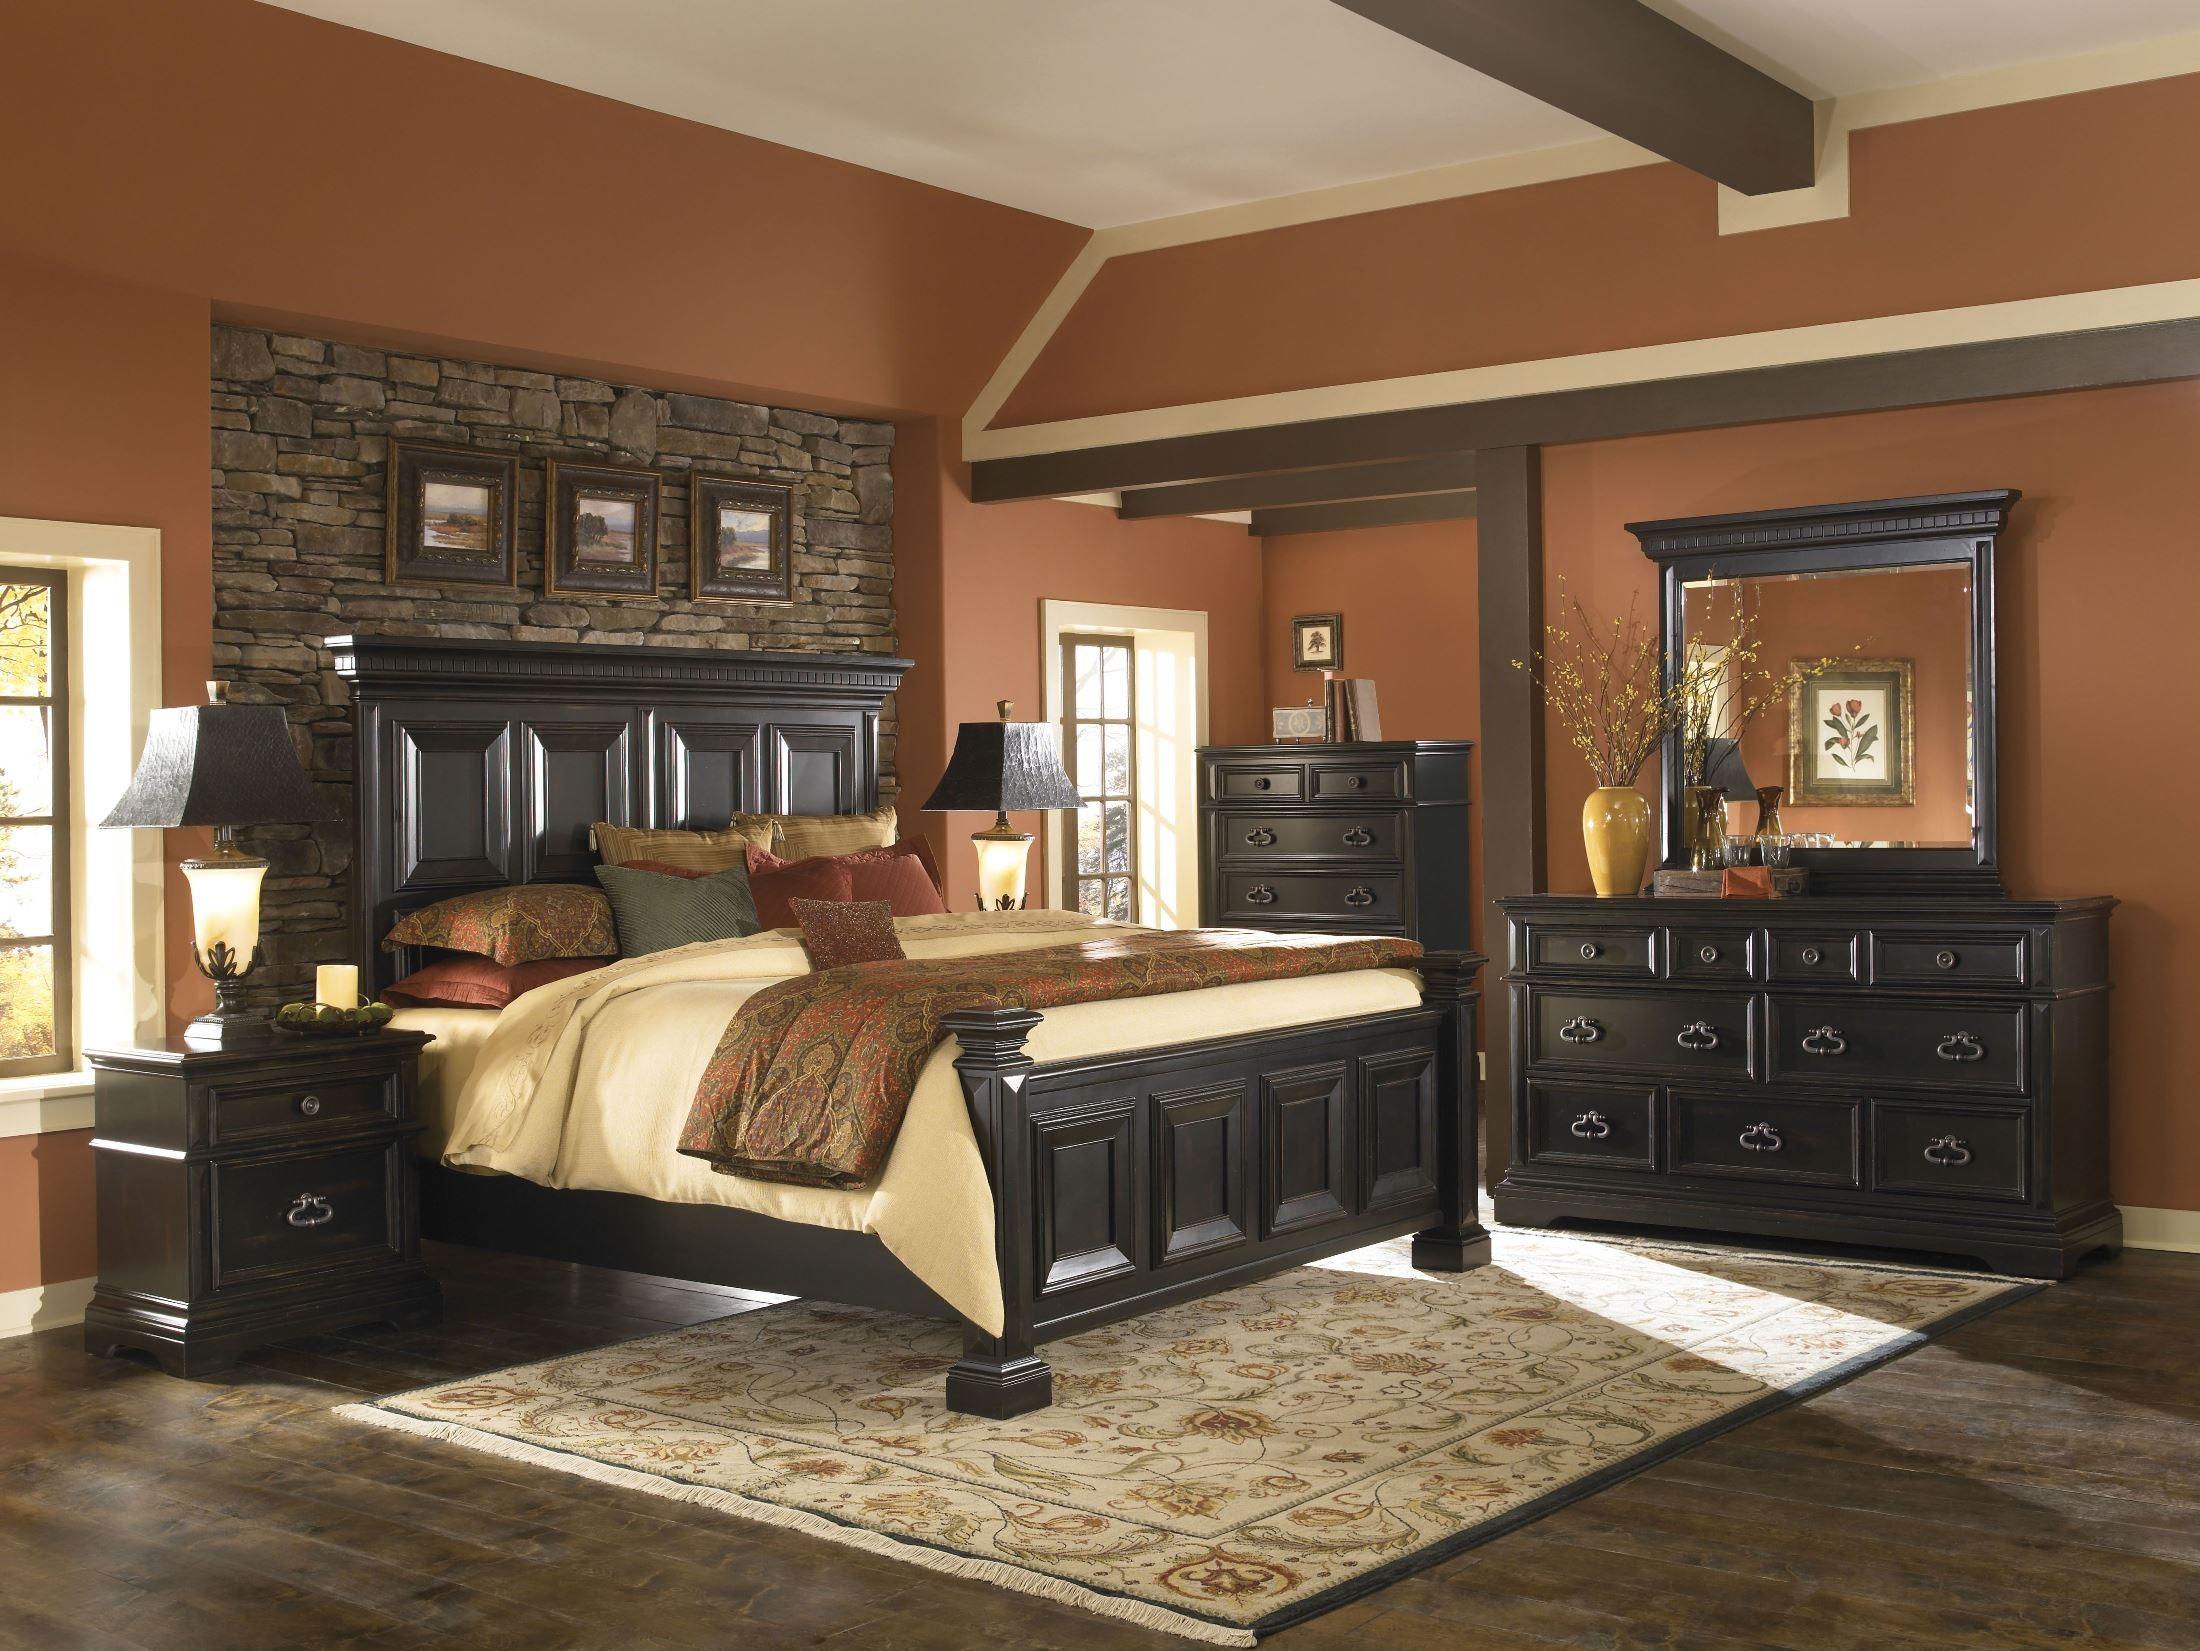 Pulaski Living Room Furniture Brookfield Bedroom Set From Pulaski 9931 Coleman Furniture